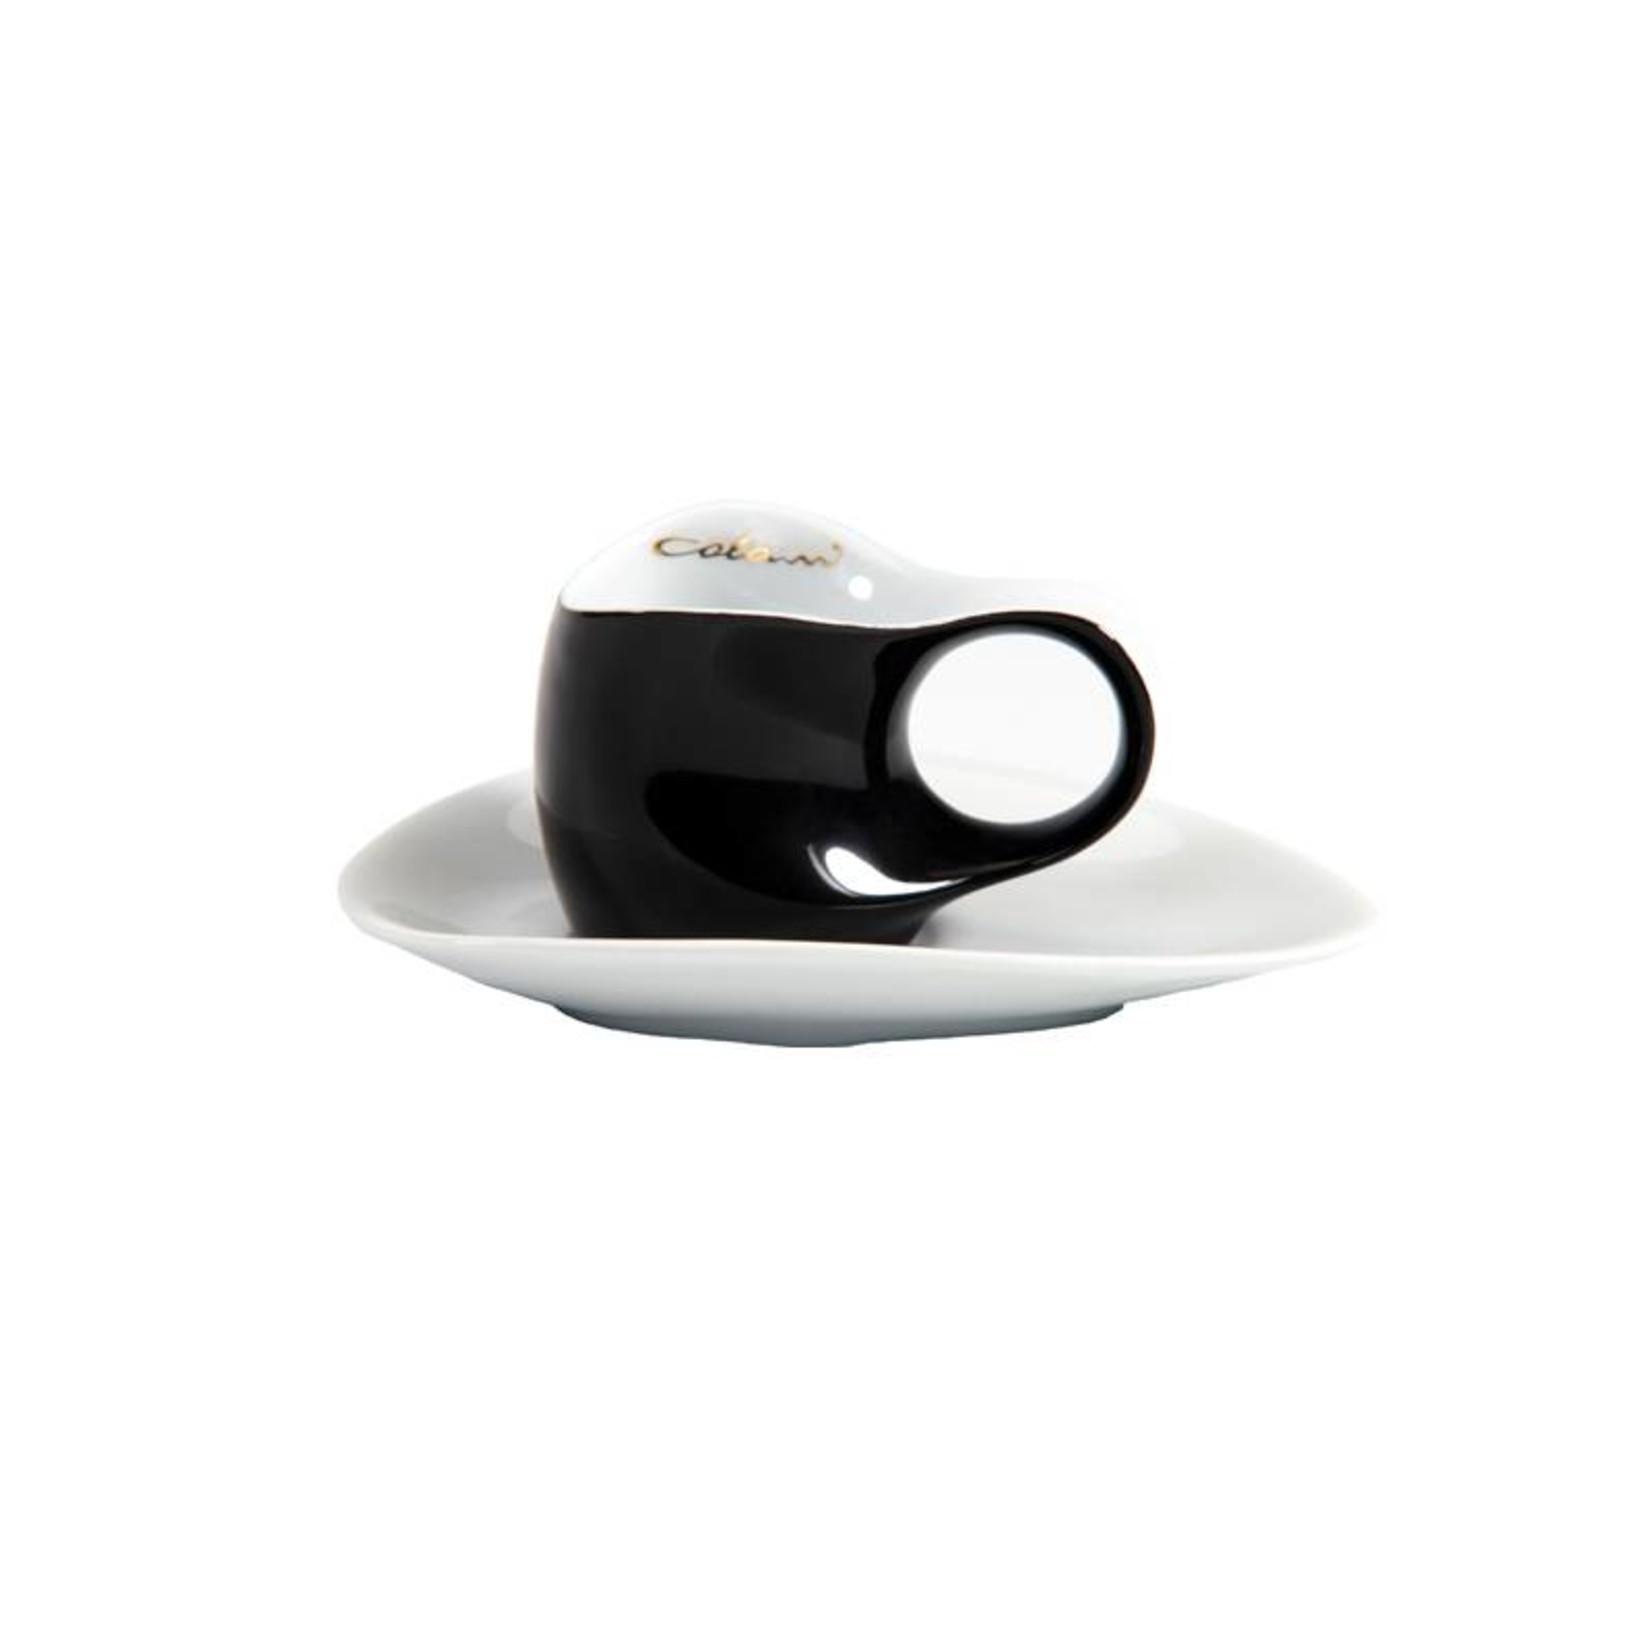 Colani Porzellanserie Colani Espressotasse 2- teilig in Schwarz